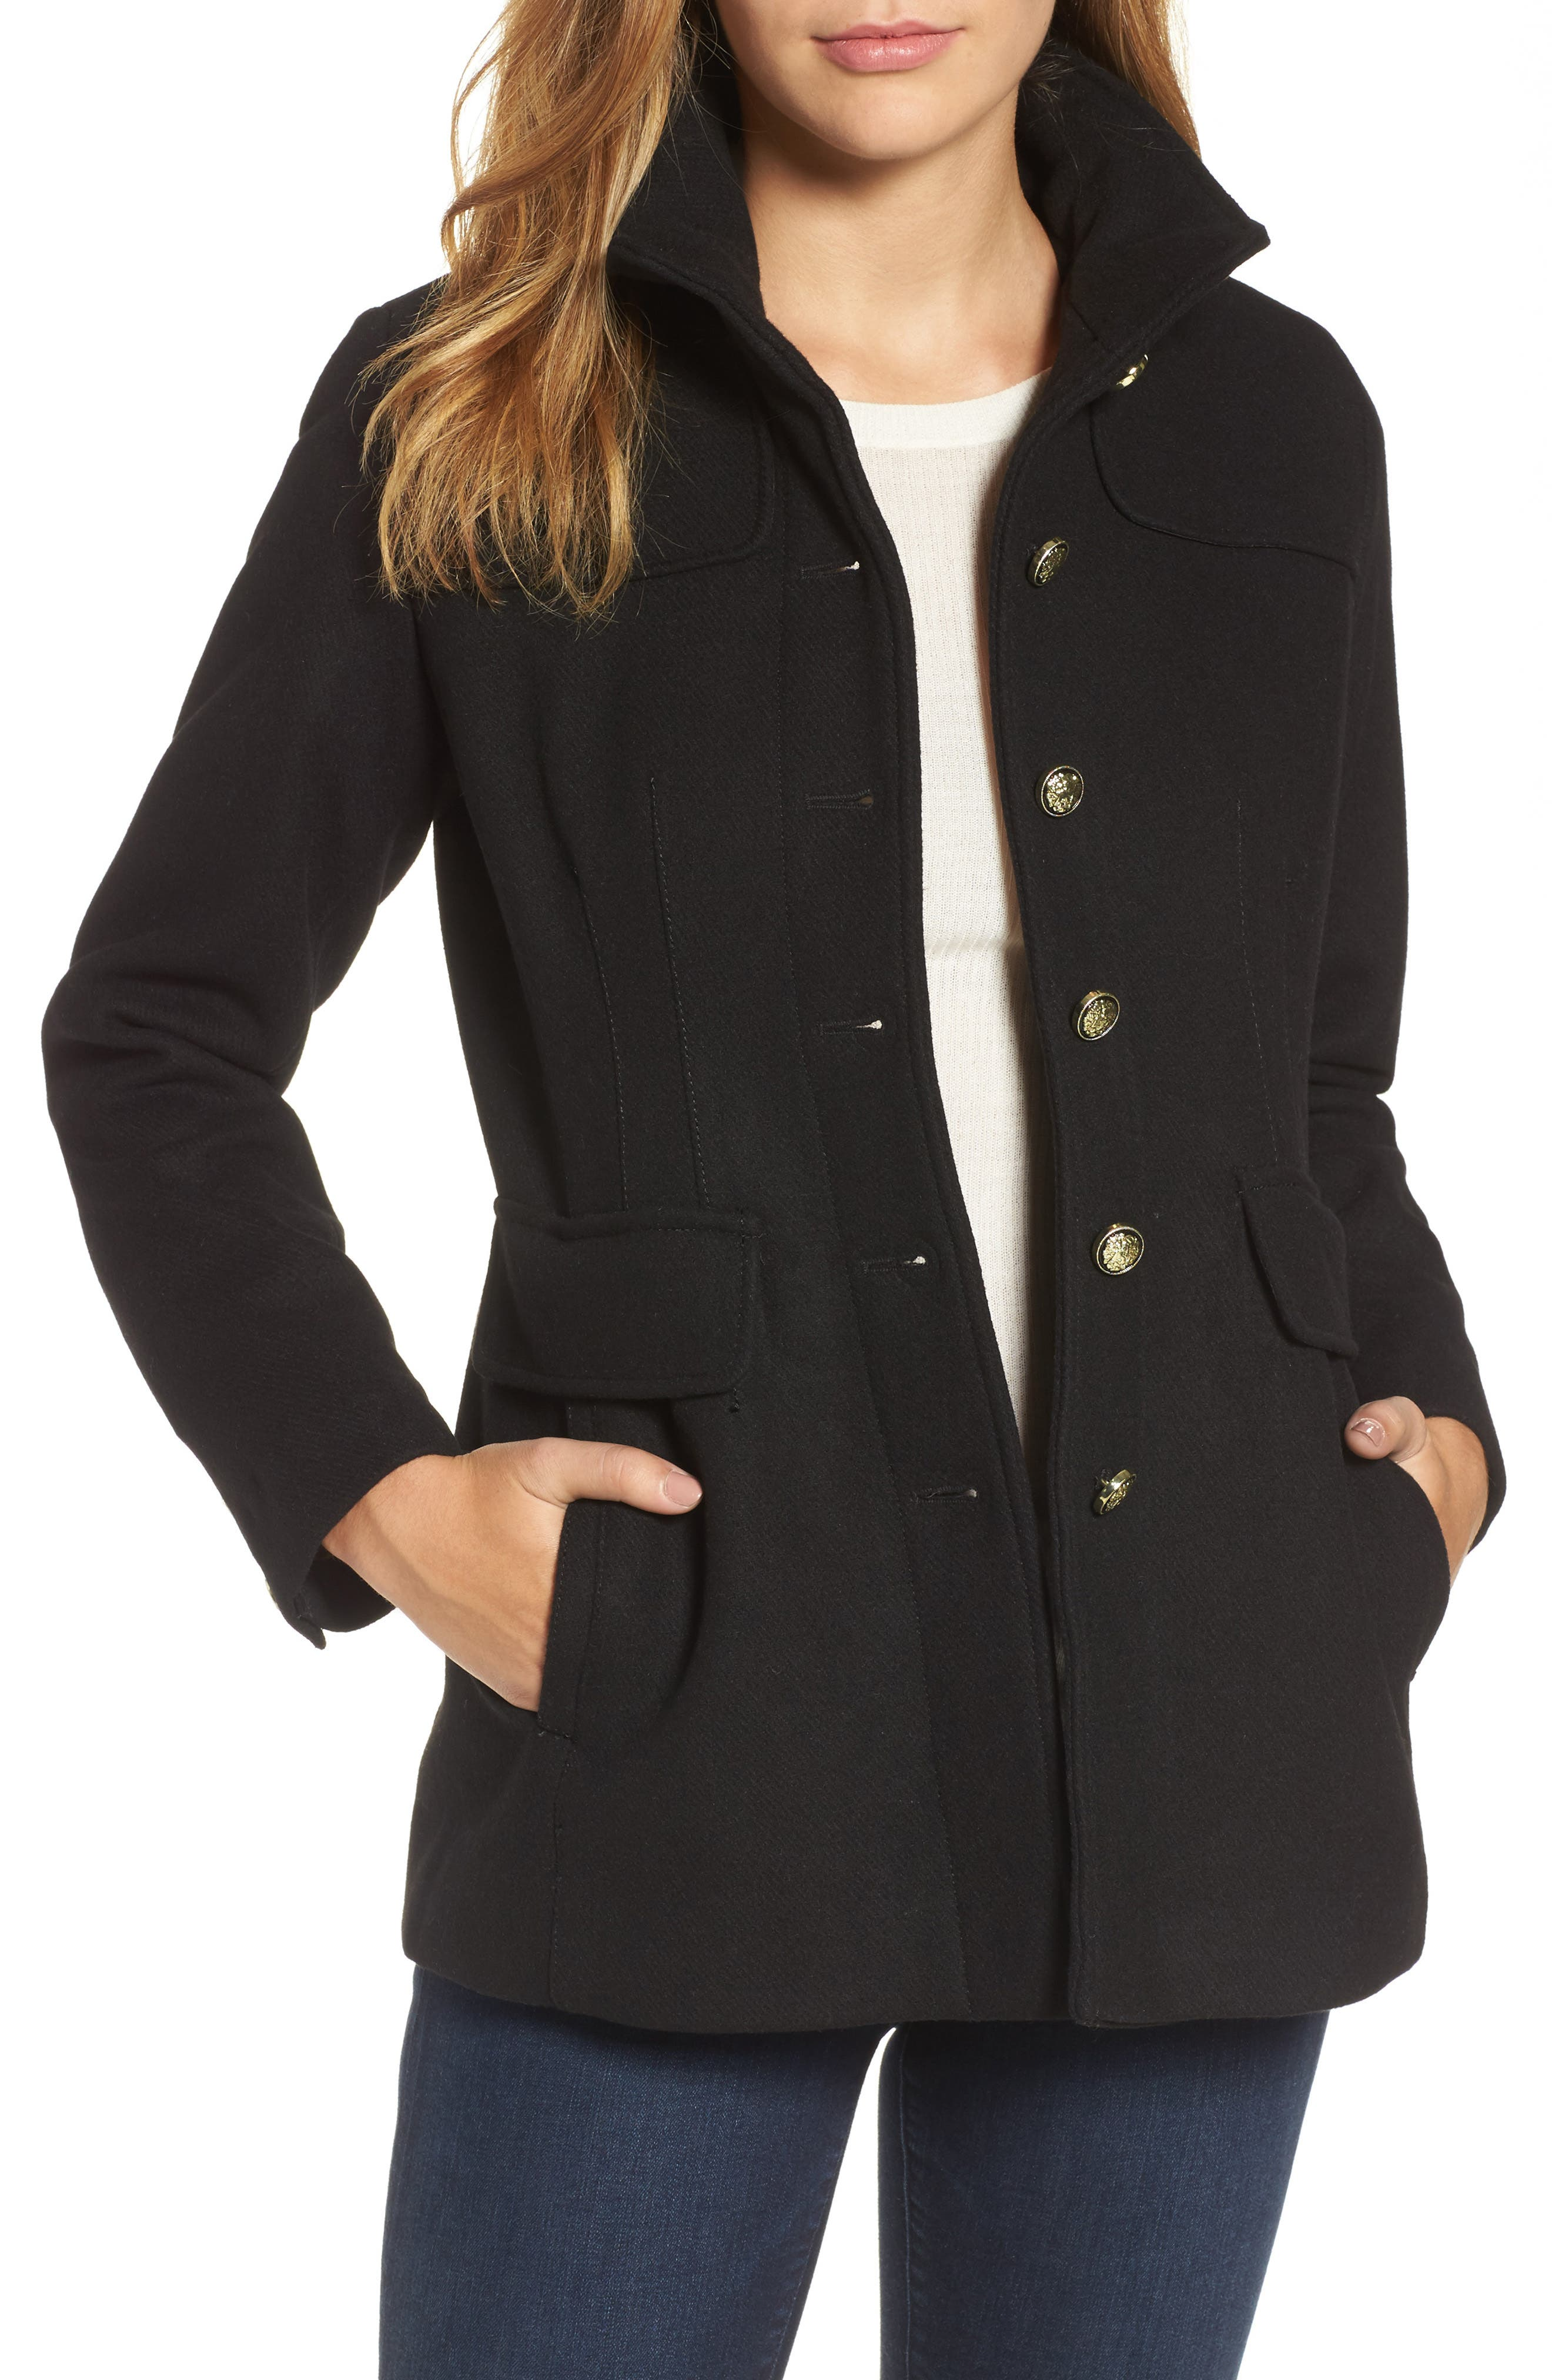 Vince Camuto Wool Blend Coat